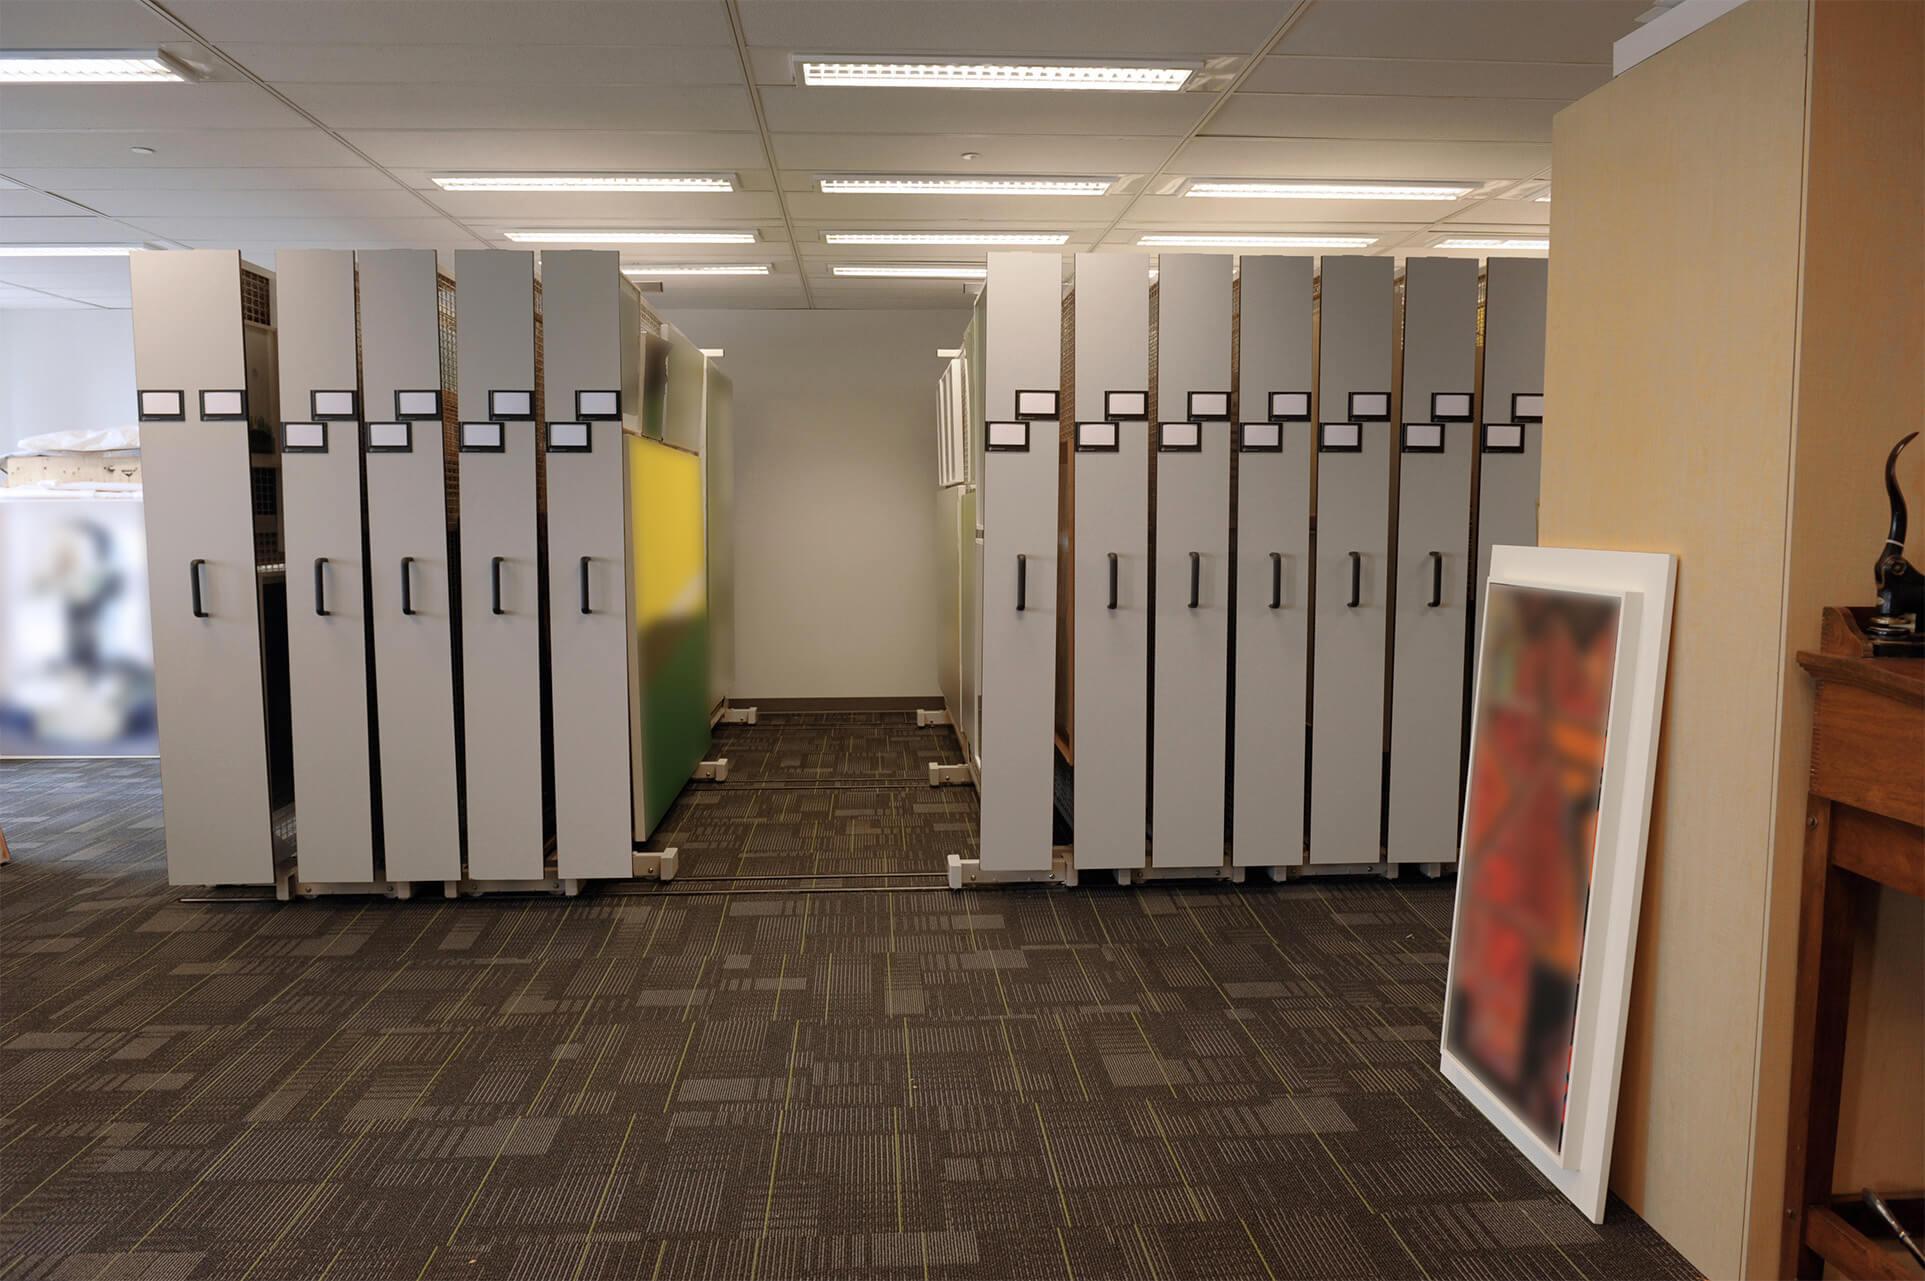 Compact mobile art racks protect fine art at Ontario Bank